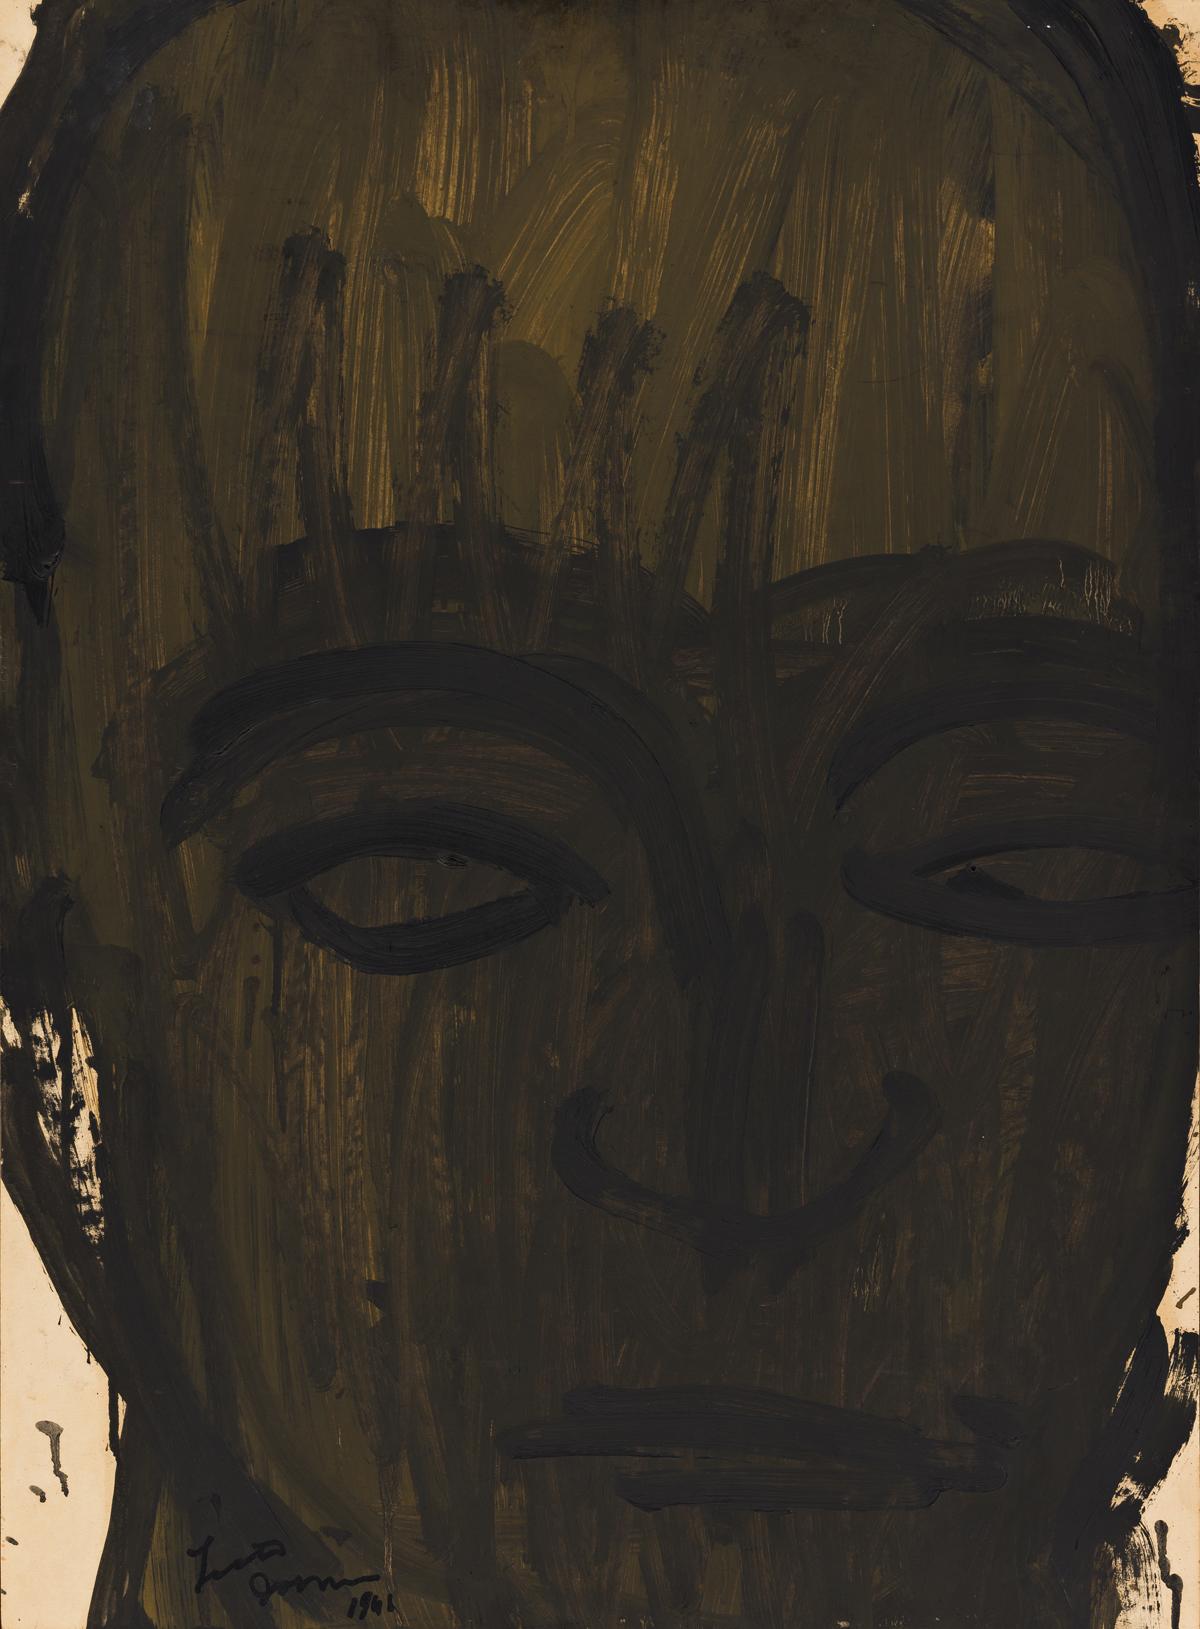 LESTER JOHNSON (1919 - 2010, AMERICAN) Man's Head.